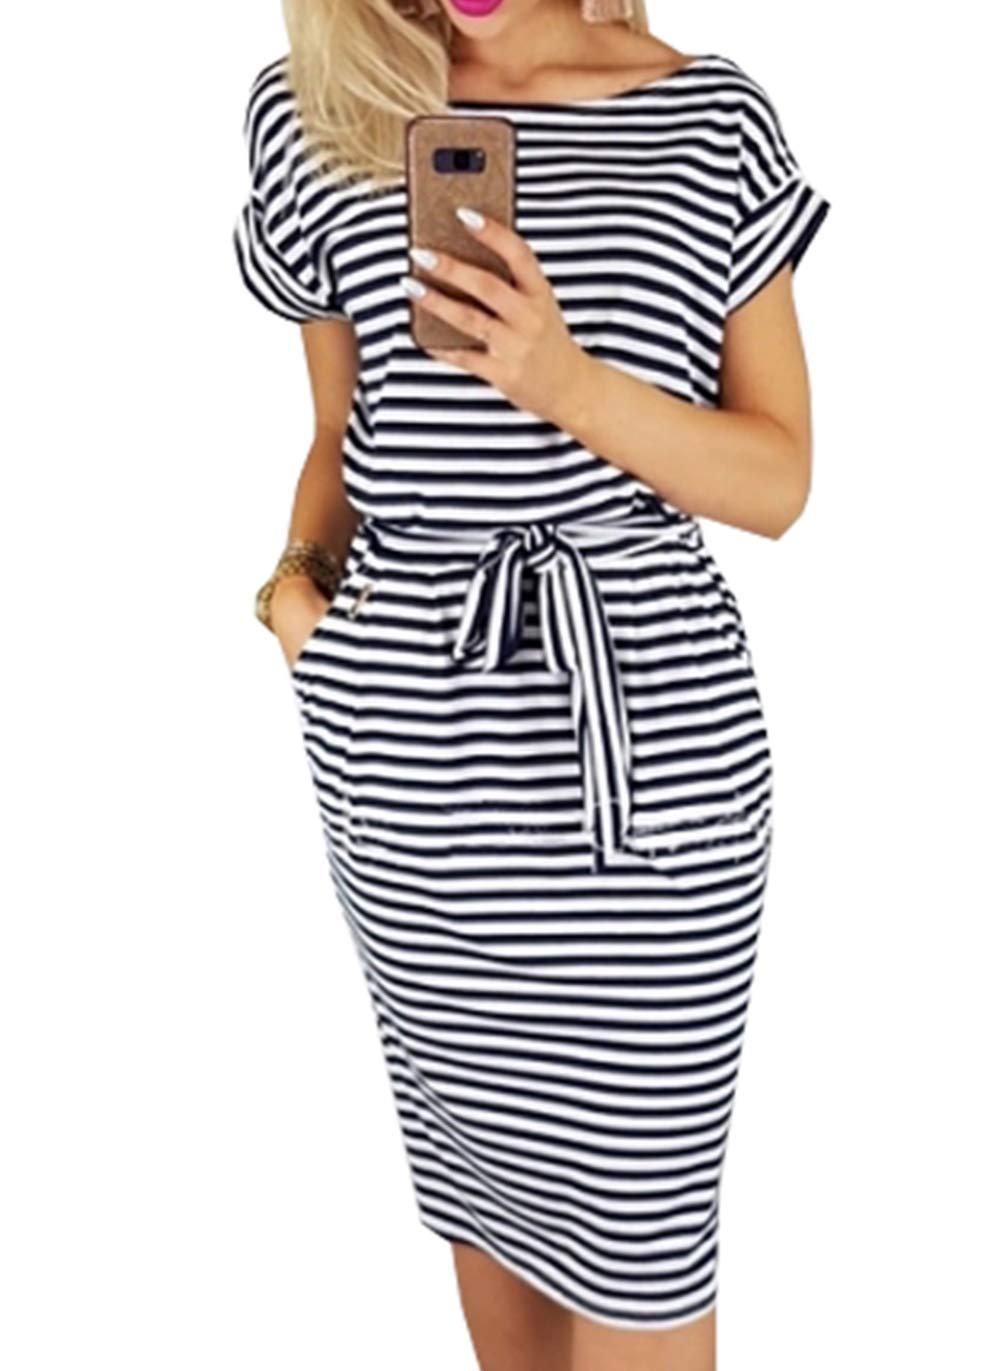 PRETTYGARDEN Women's 2019 Casual Short Sleeve Party Bodycon Sheath Belted Dress with Pockets (U-Black, Medium)